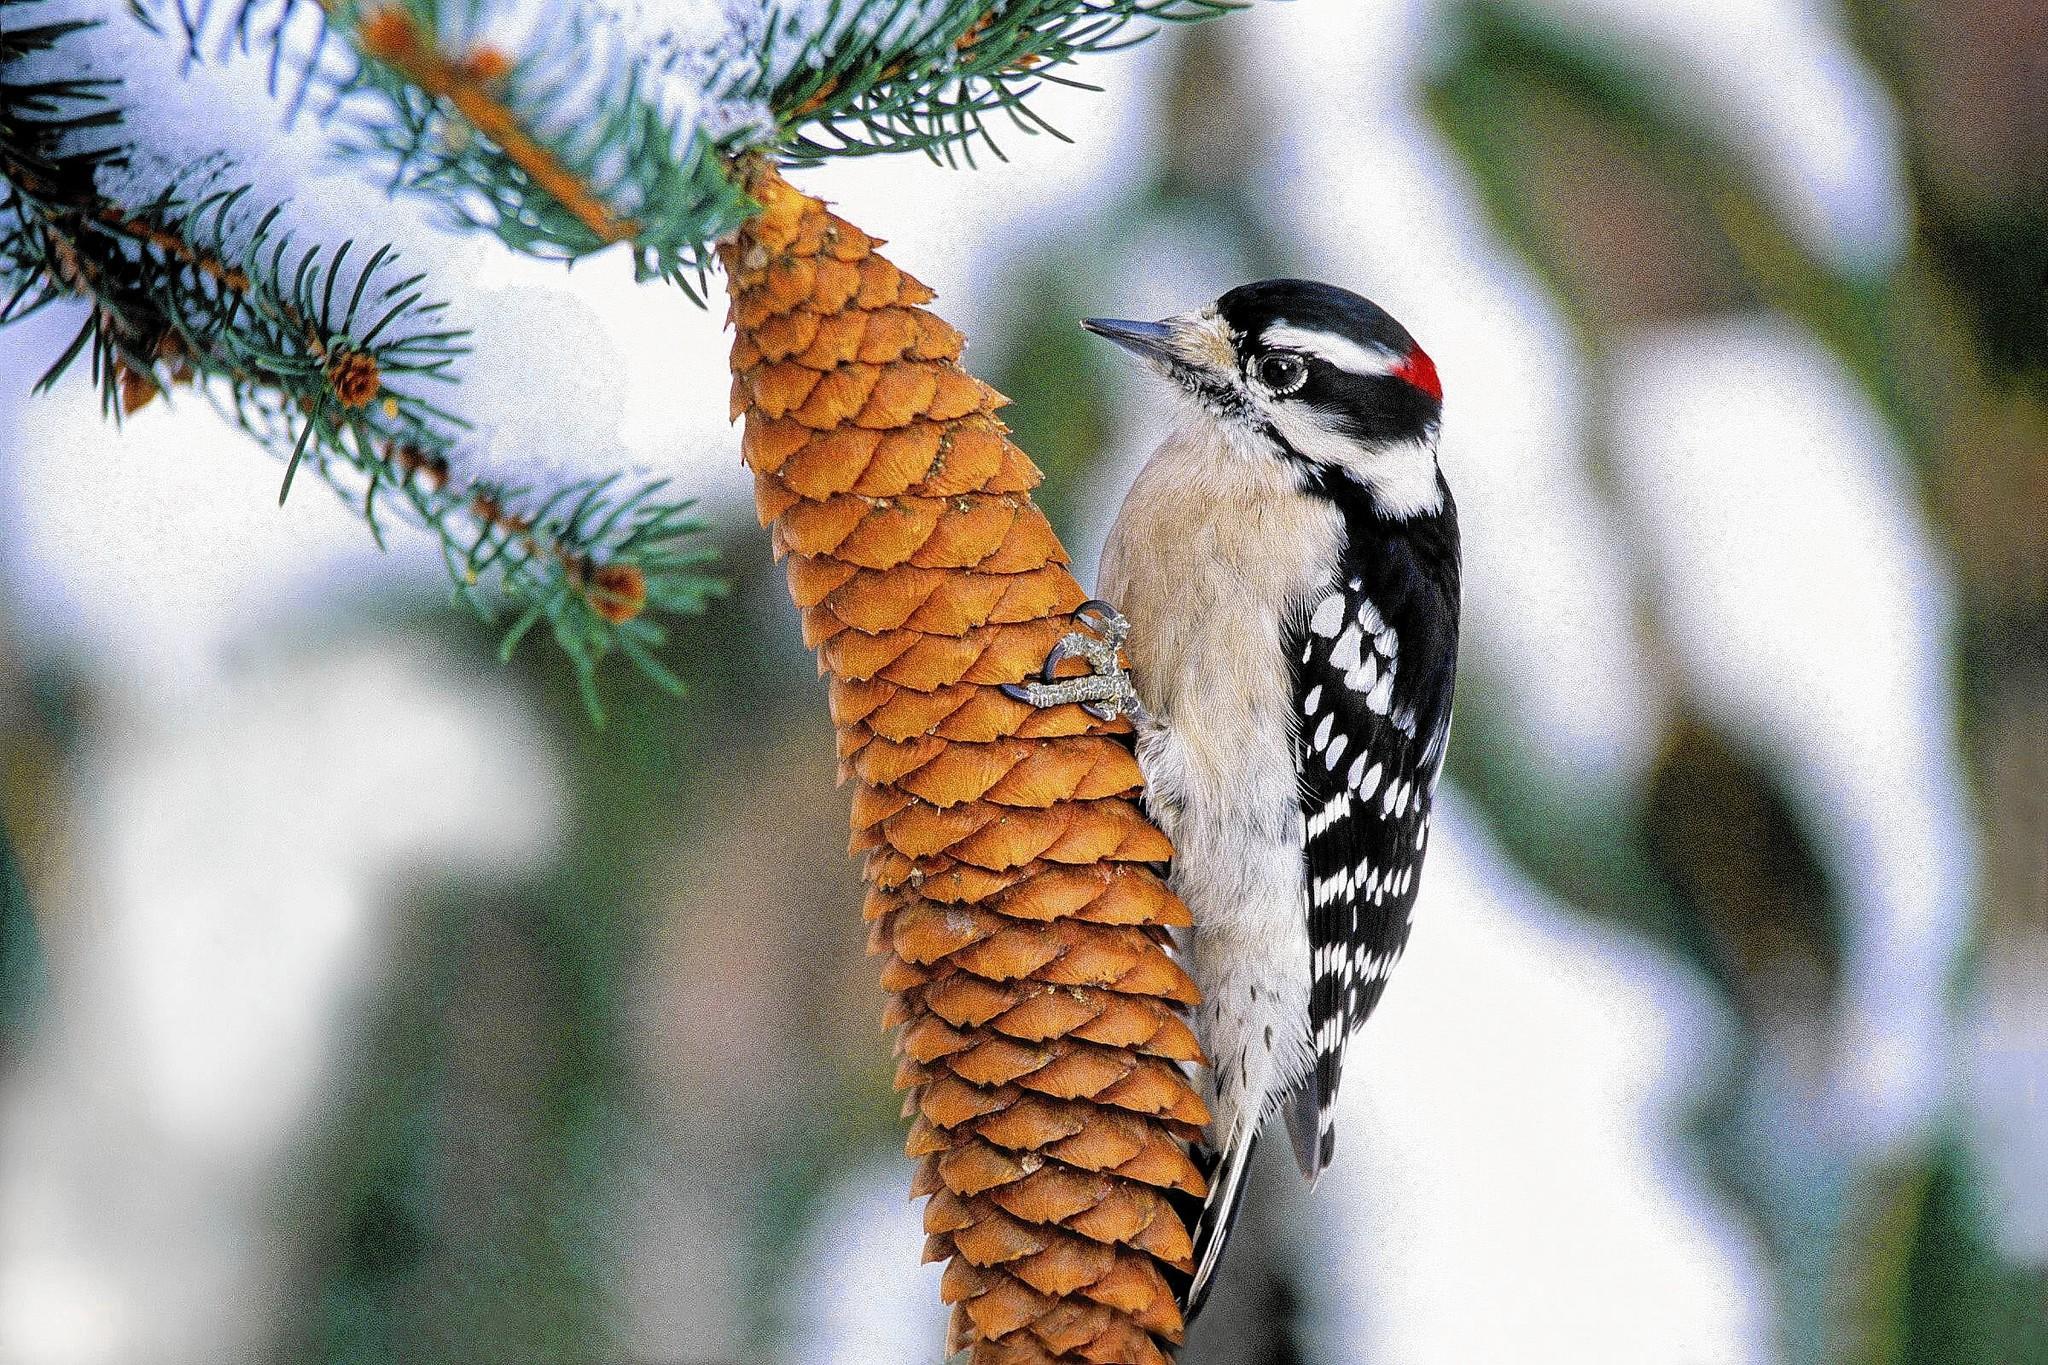 the bird friendly garden tribunedigital chicagotribune